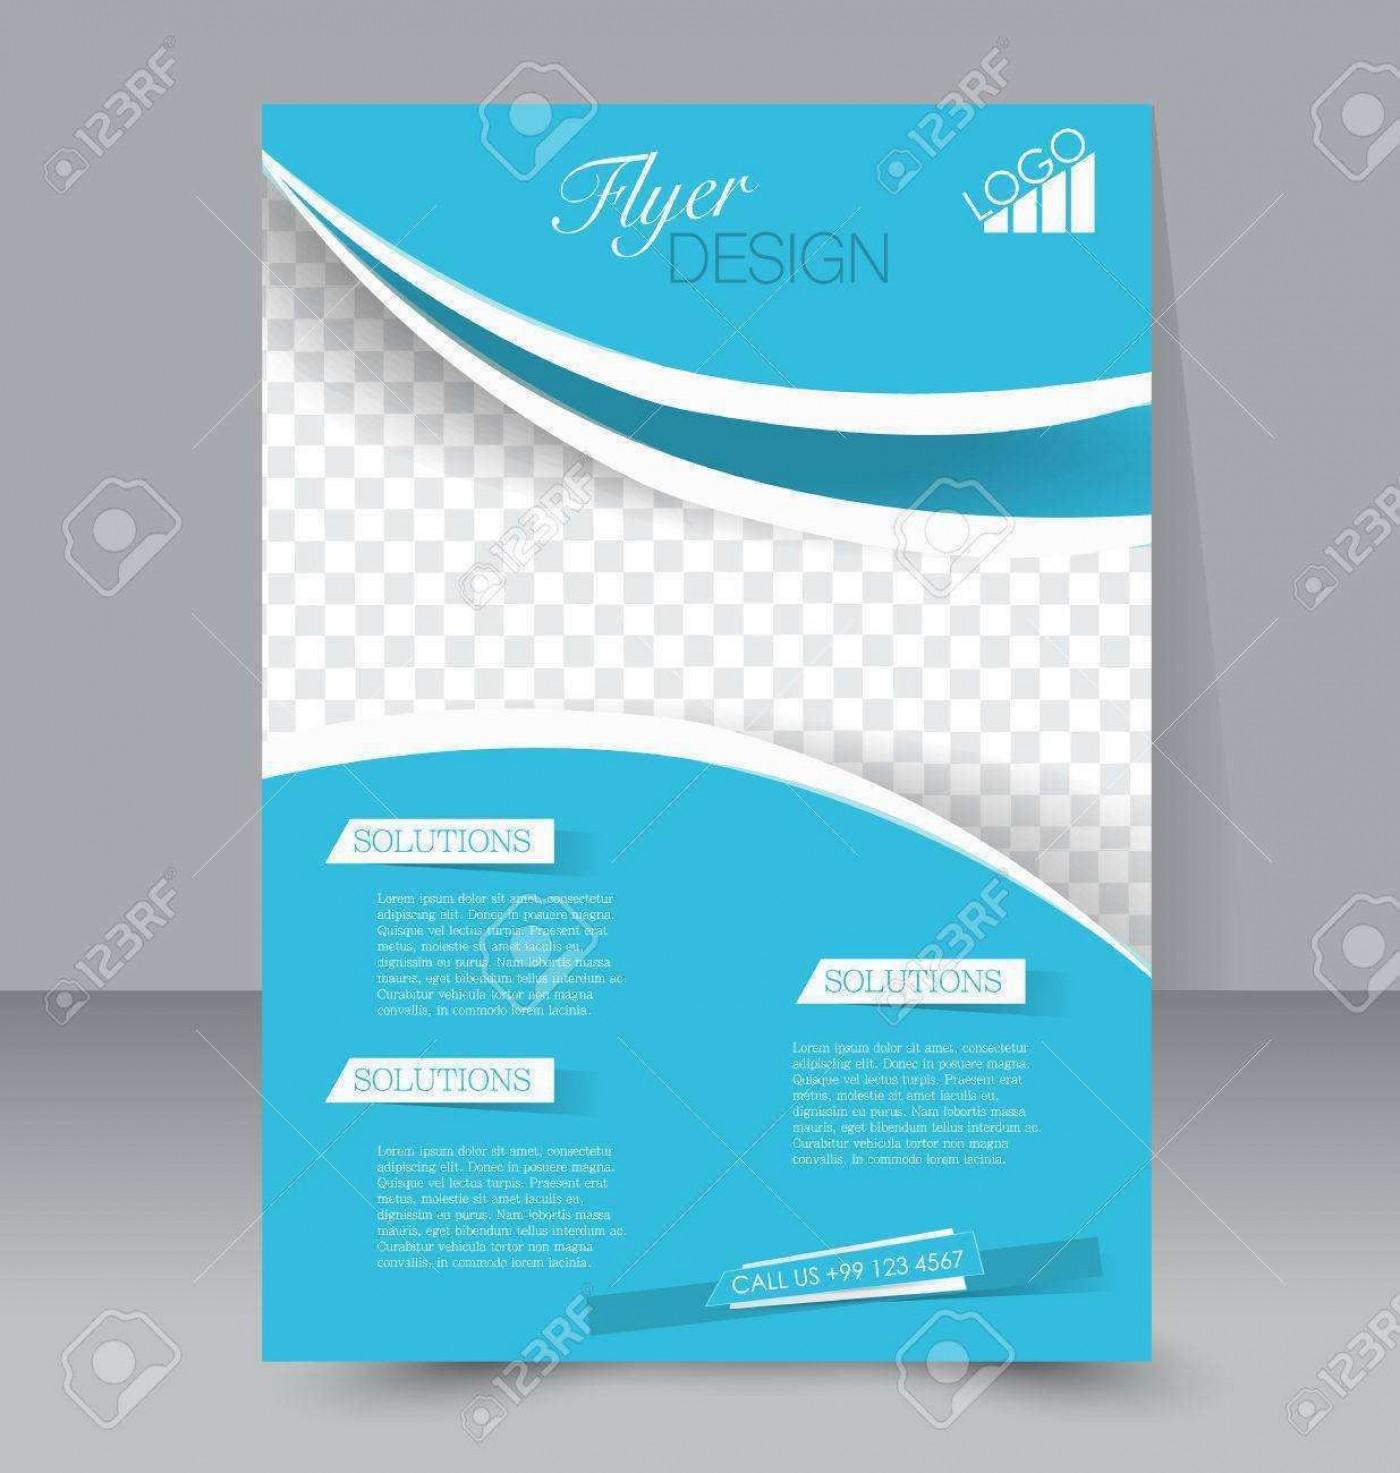 001 Sensational Free Editable Flyer Template High Def  Busines Fundraising1400